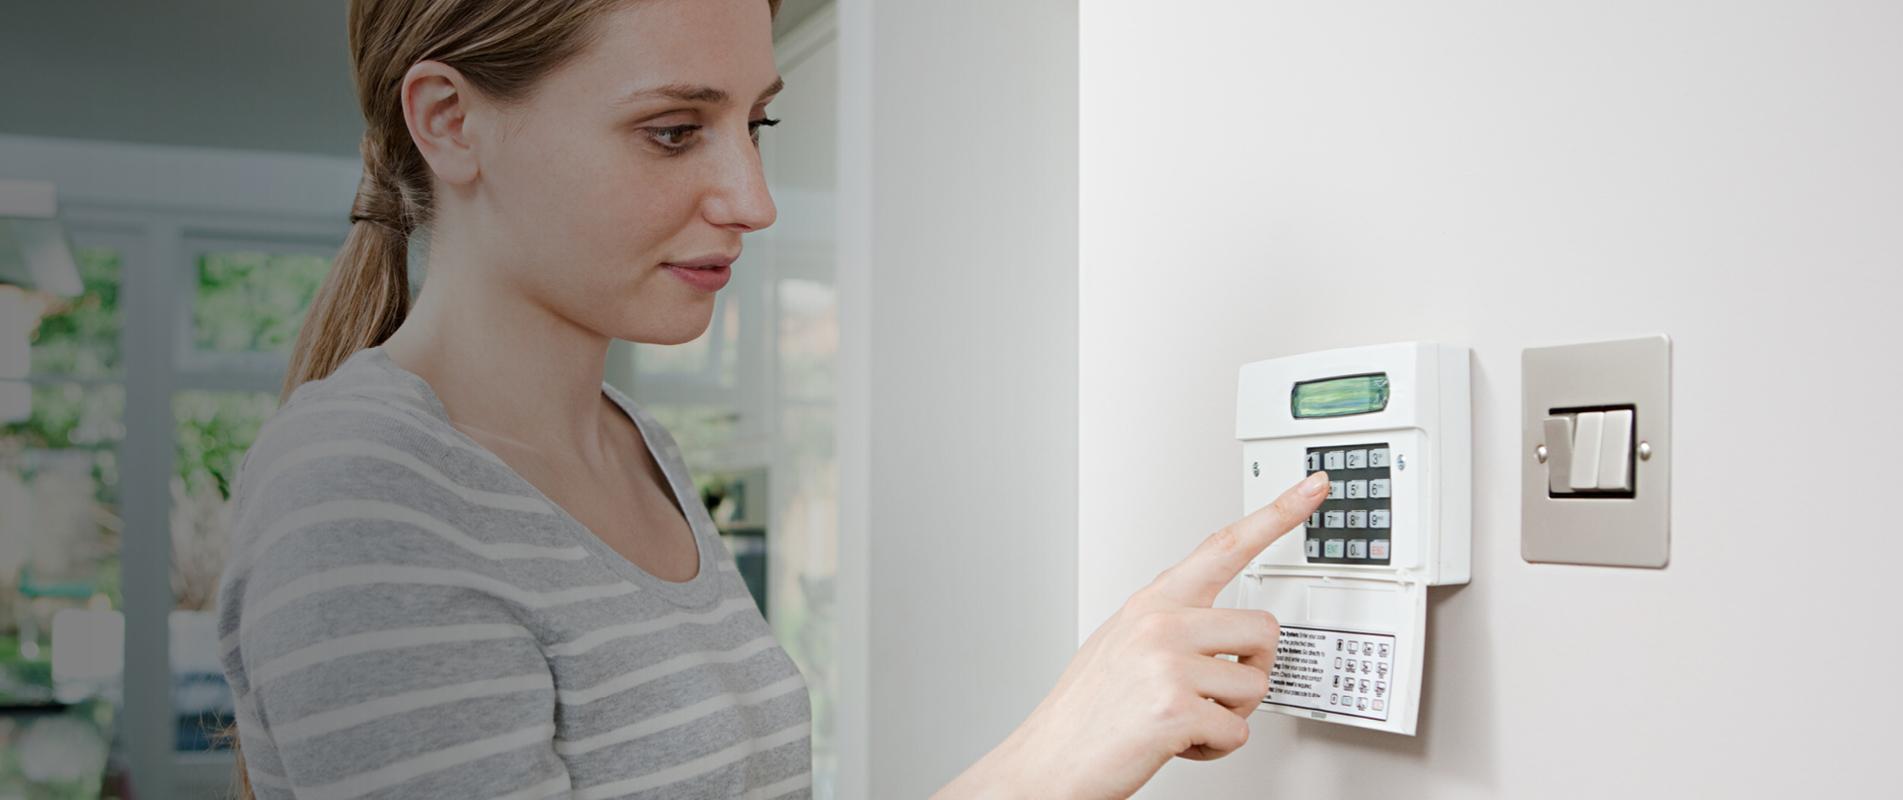 Blonde lady setting home security alarm using keypad